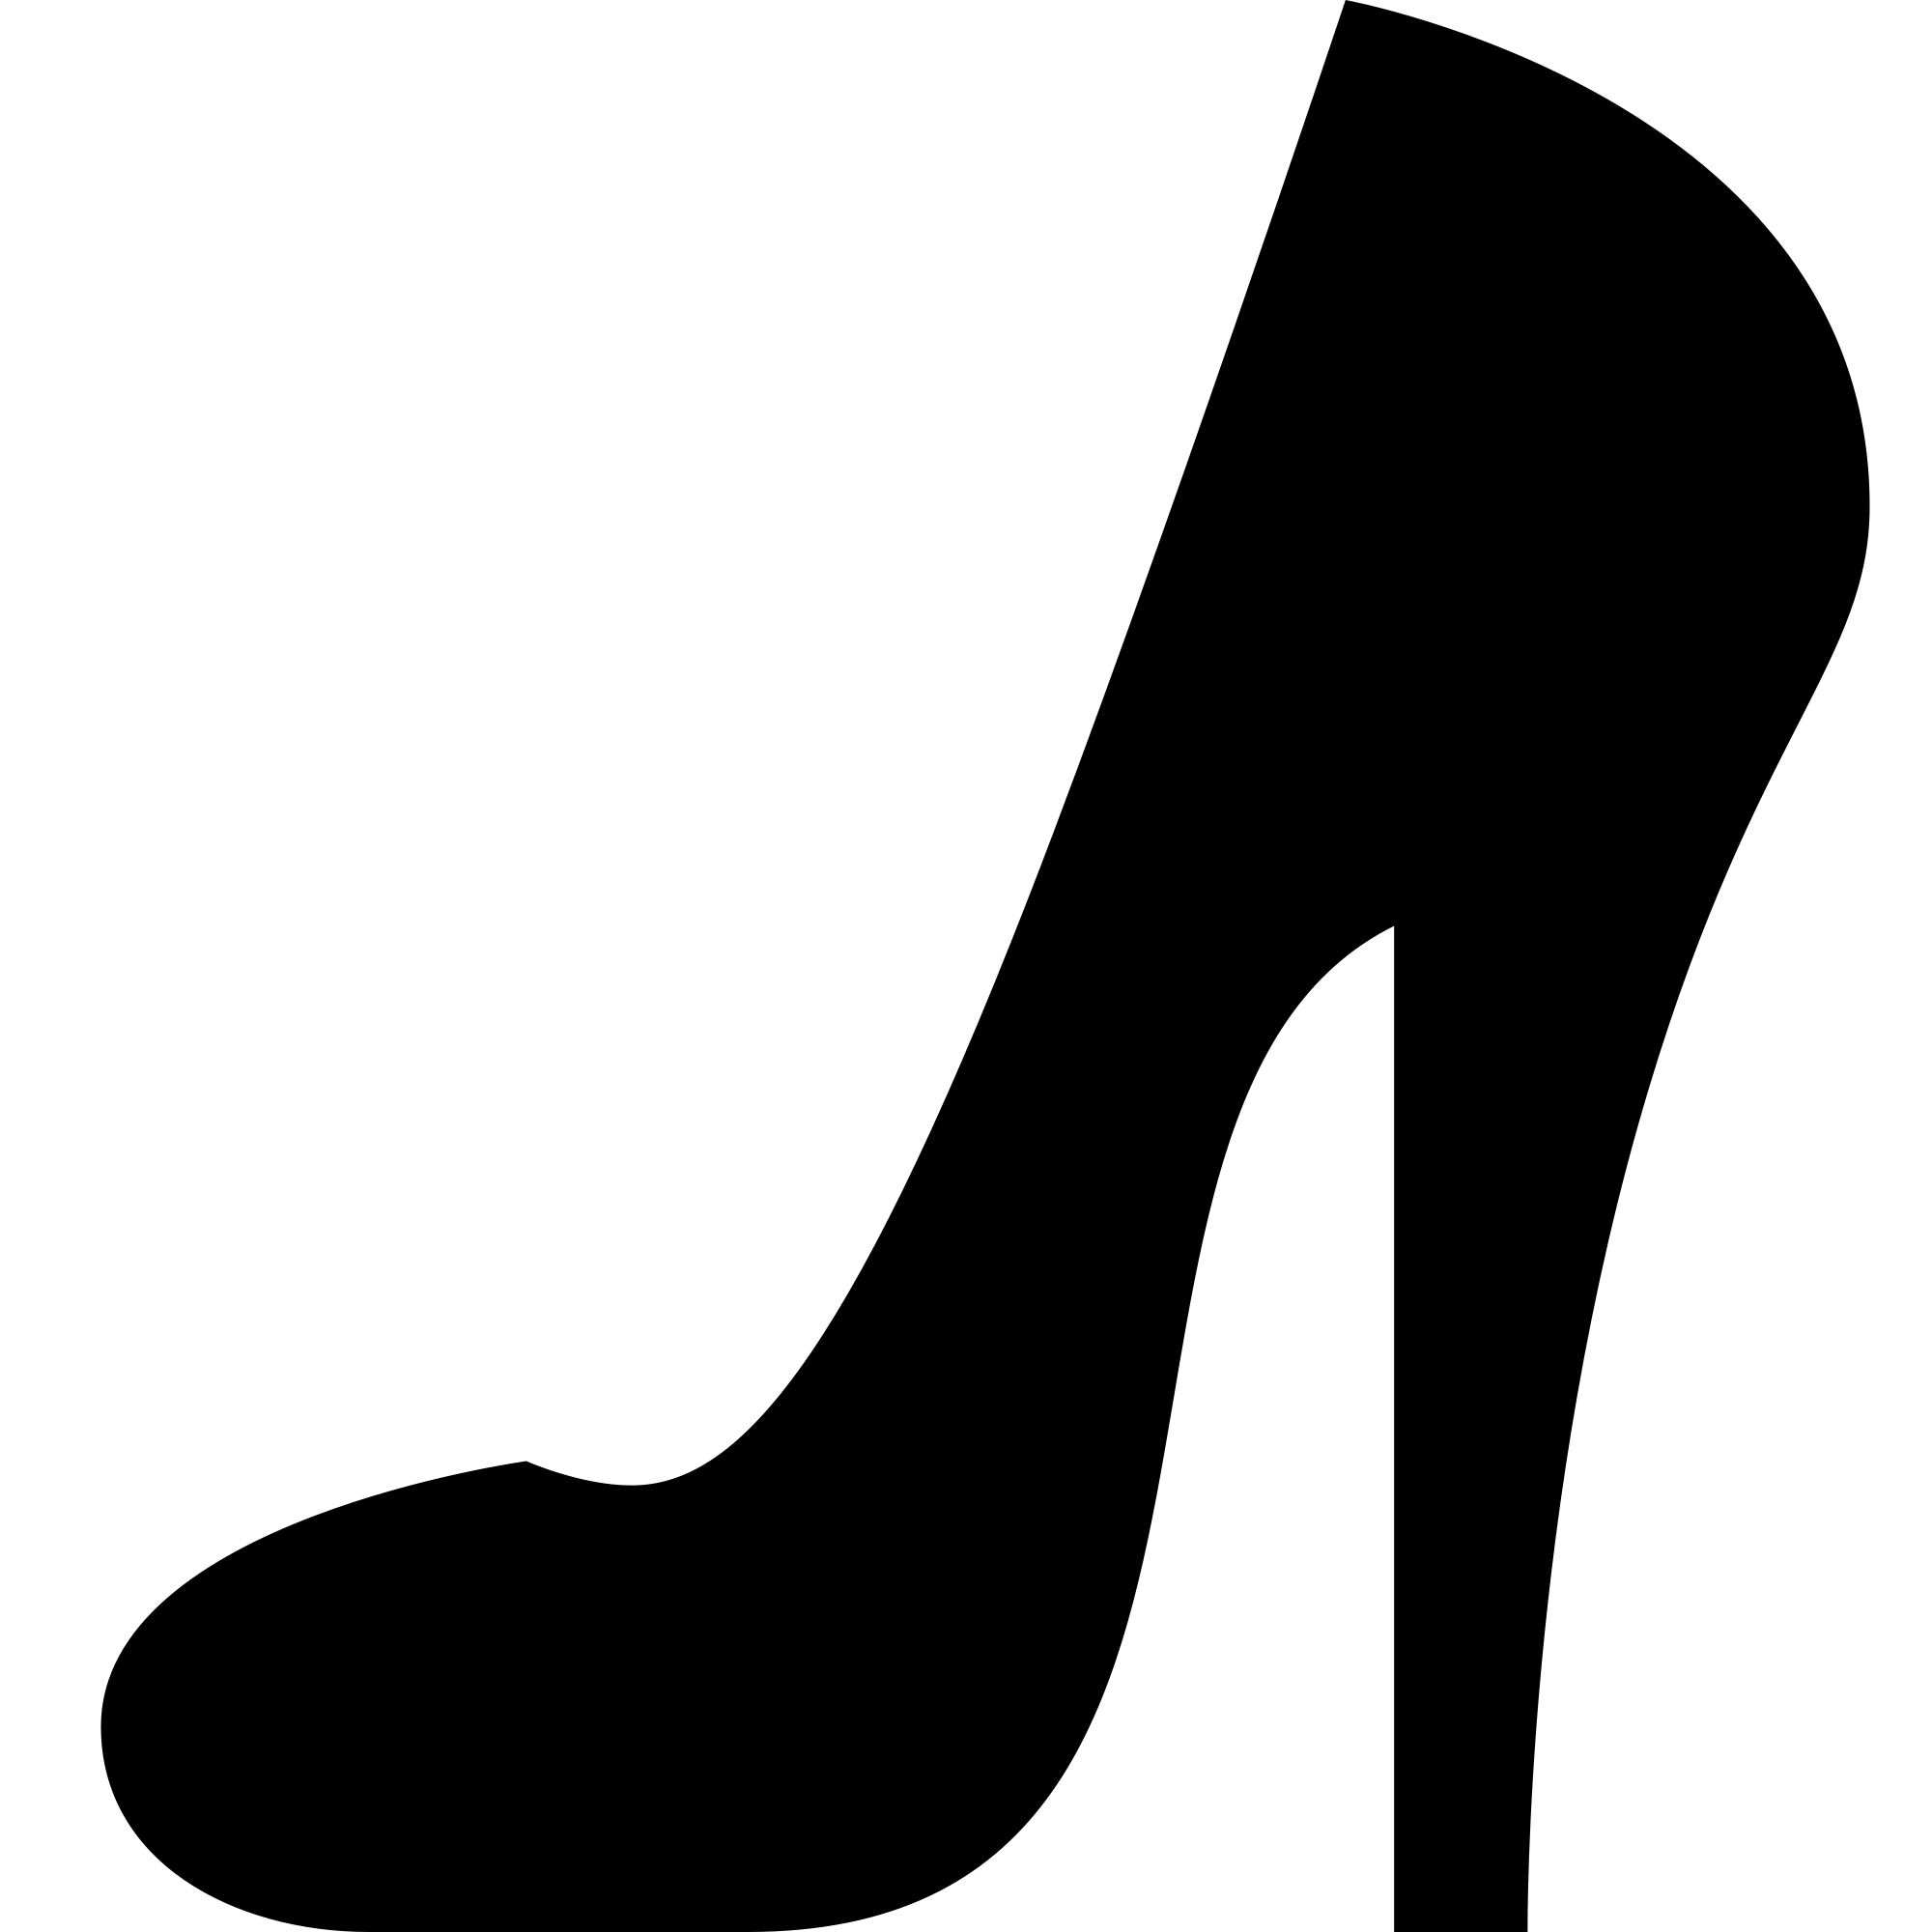 Heels clipart svg. File noun project wikimedia